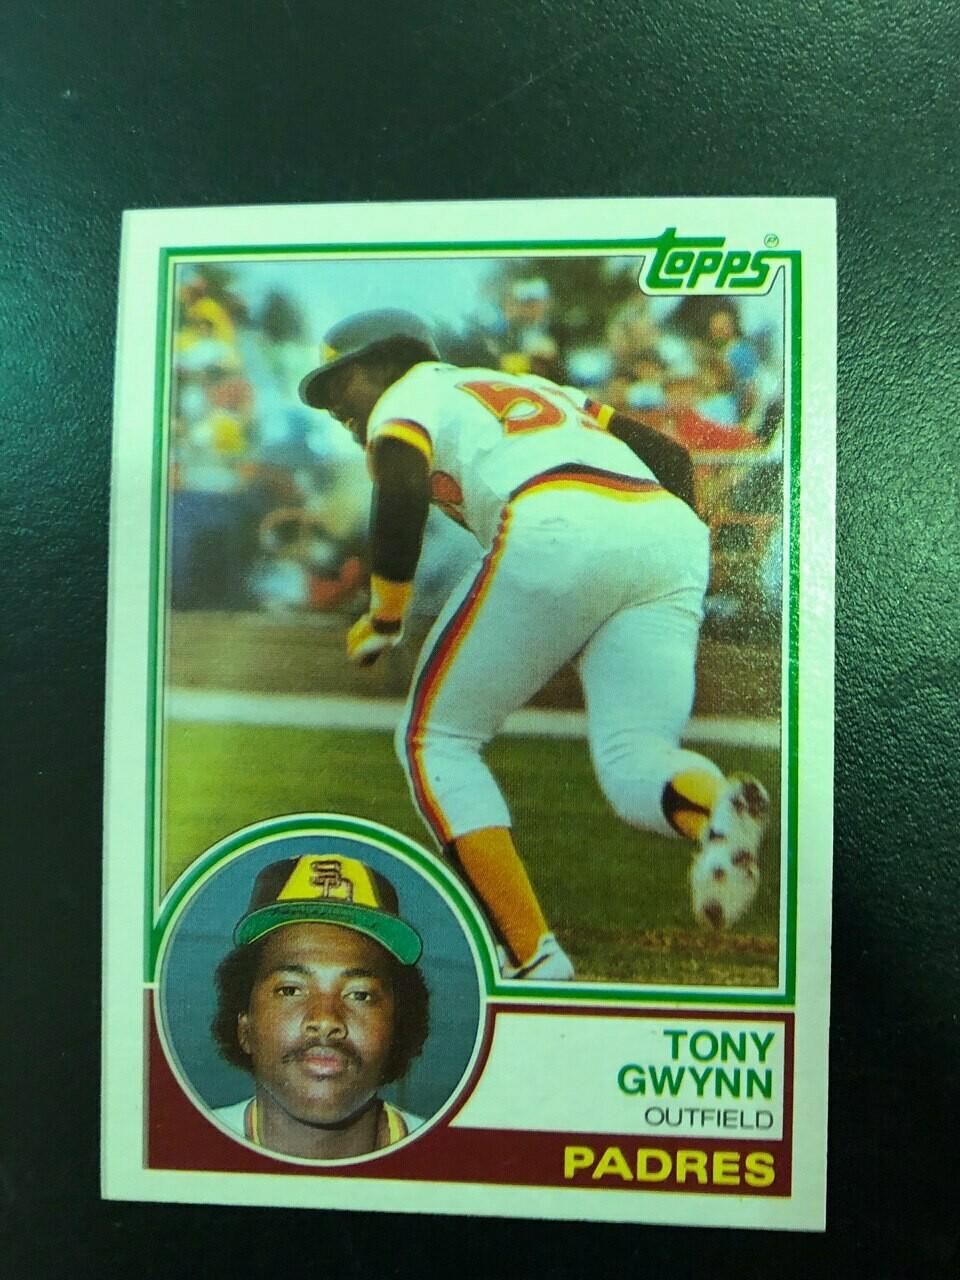 1983 Topps Tony Gwynn rookie